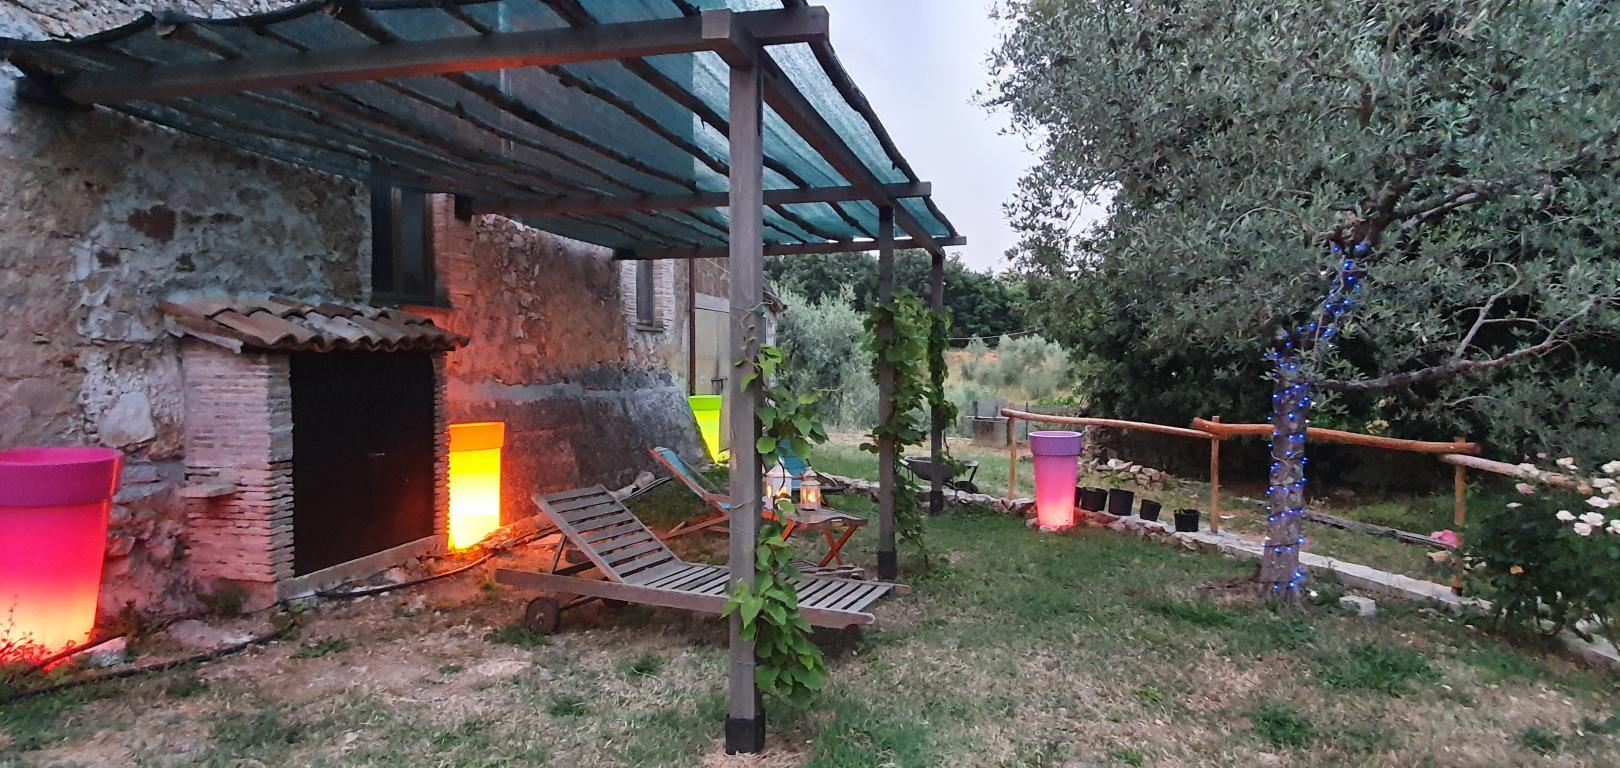 10 - Santa Restituta - Bifamiliare - Esterni